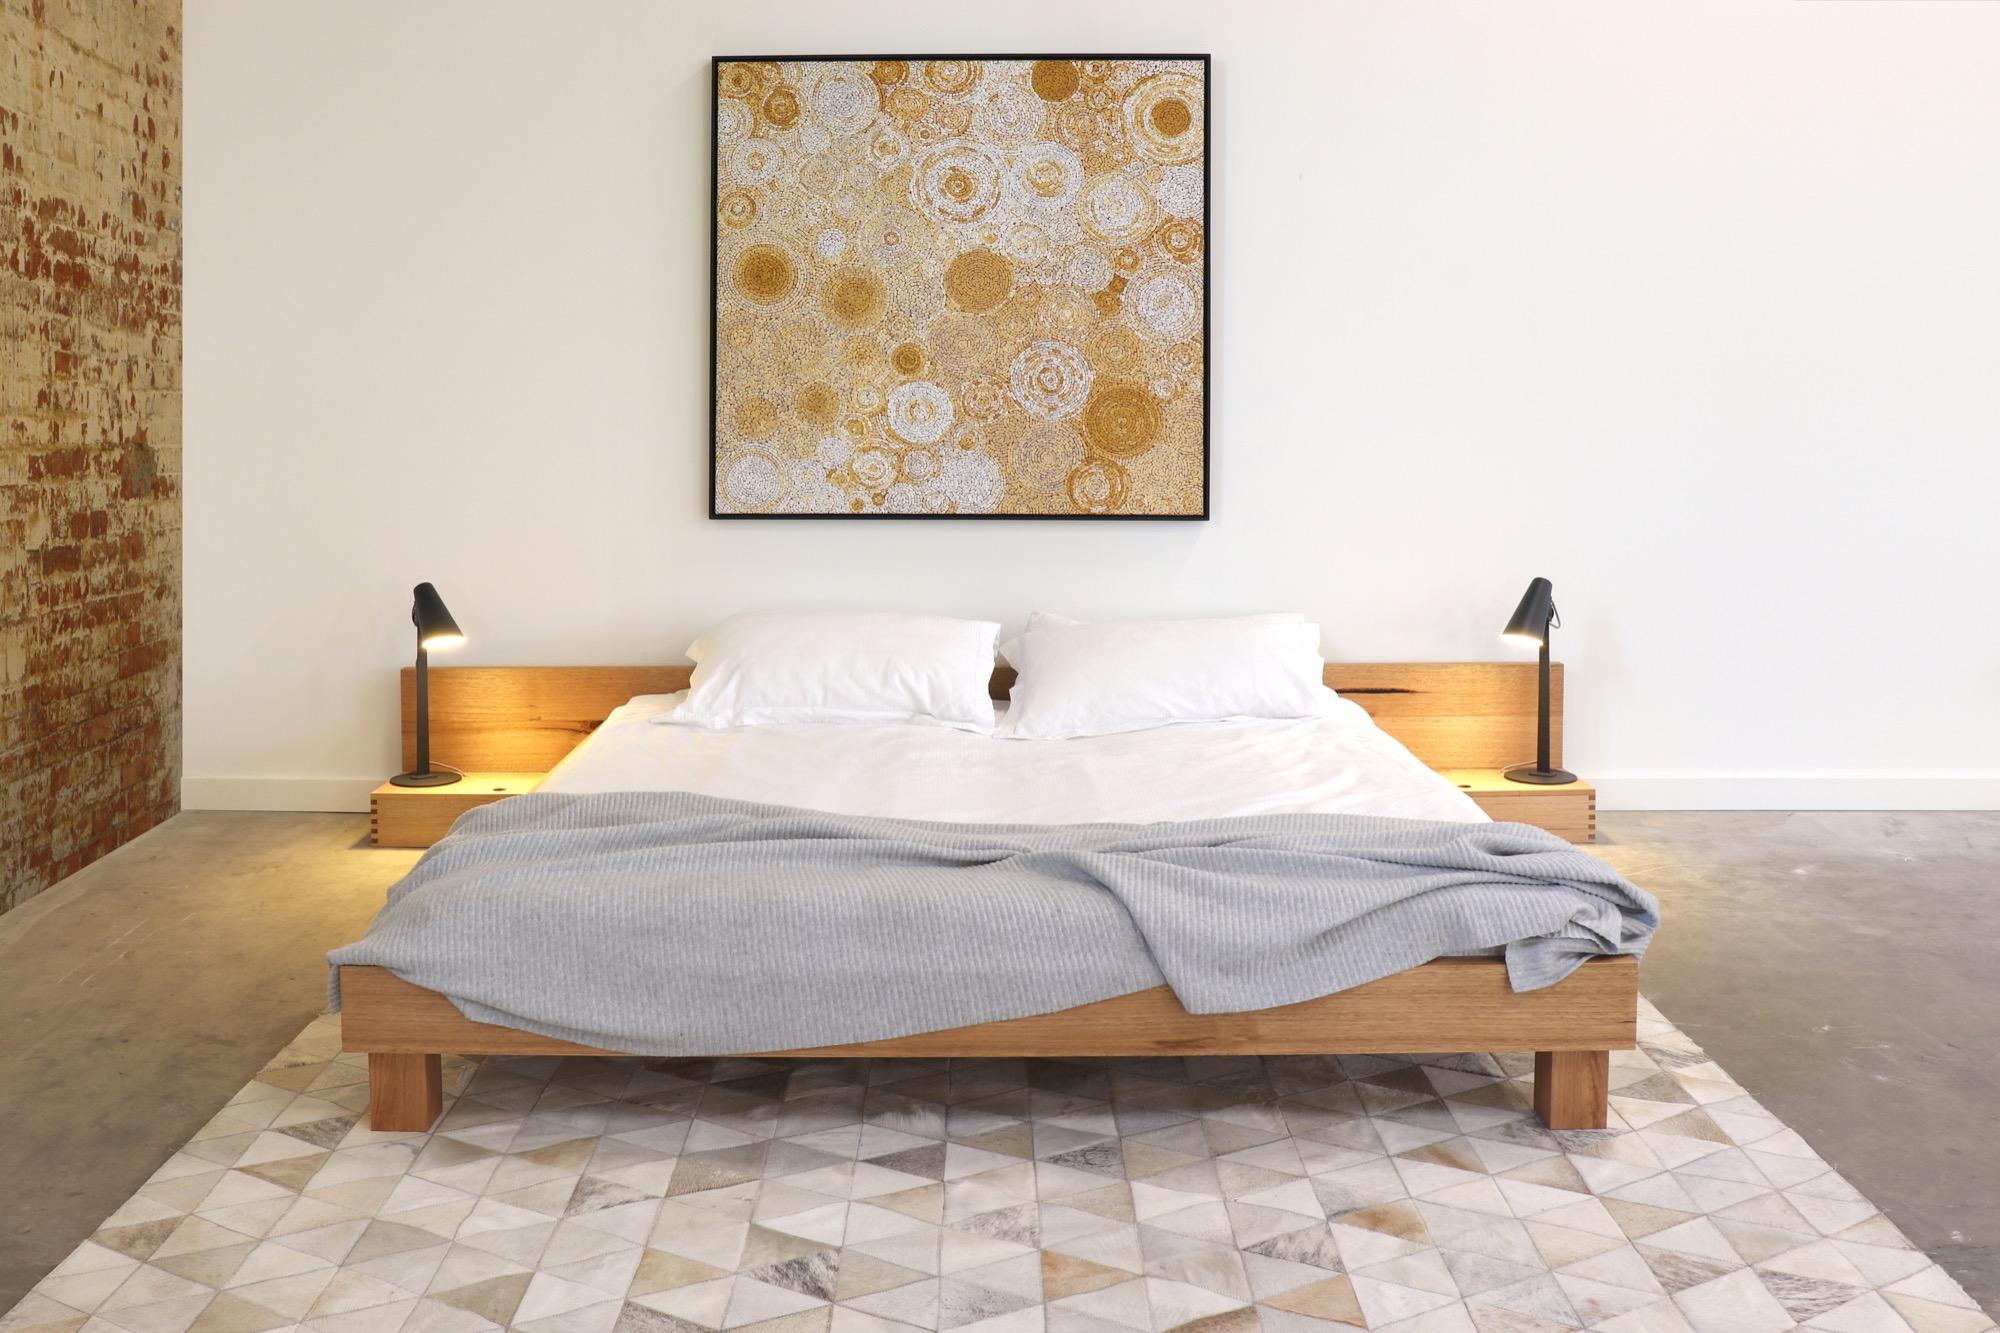 Inemuri bed by sawdust bureau bespoke furniture melbourne